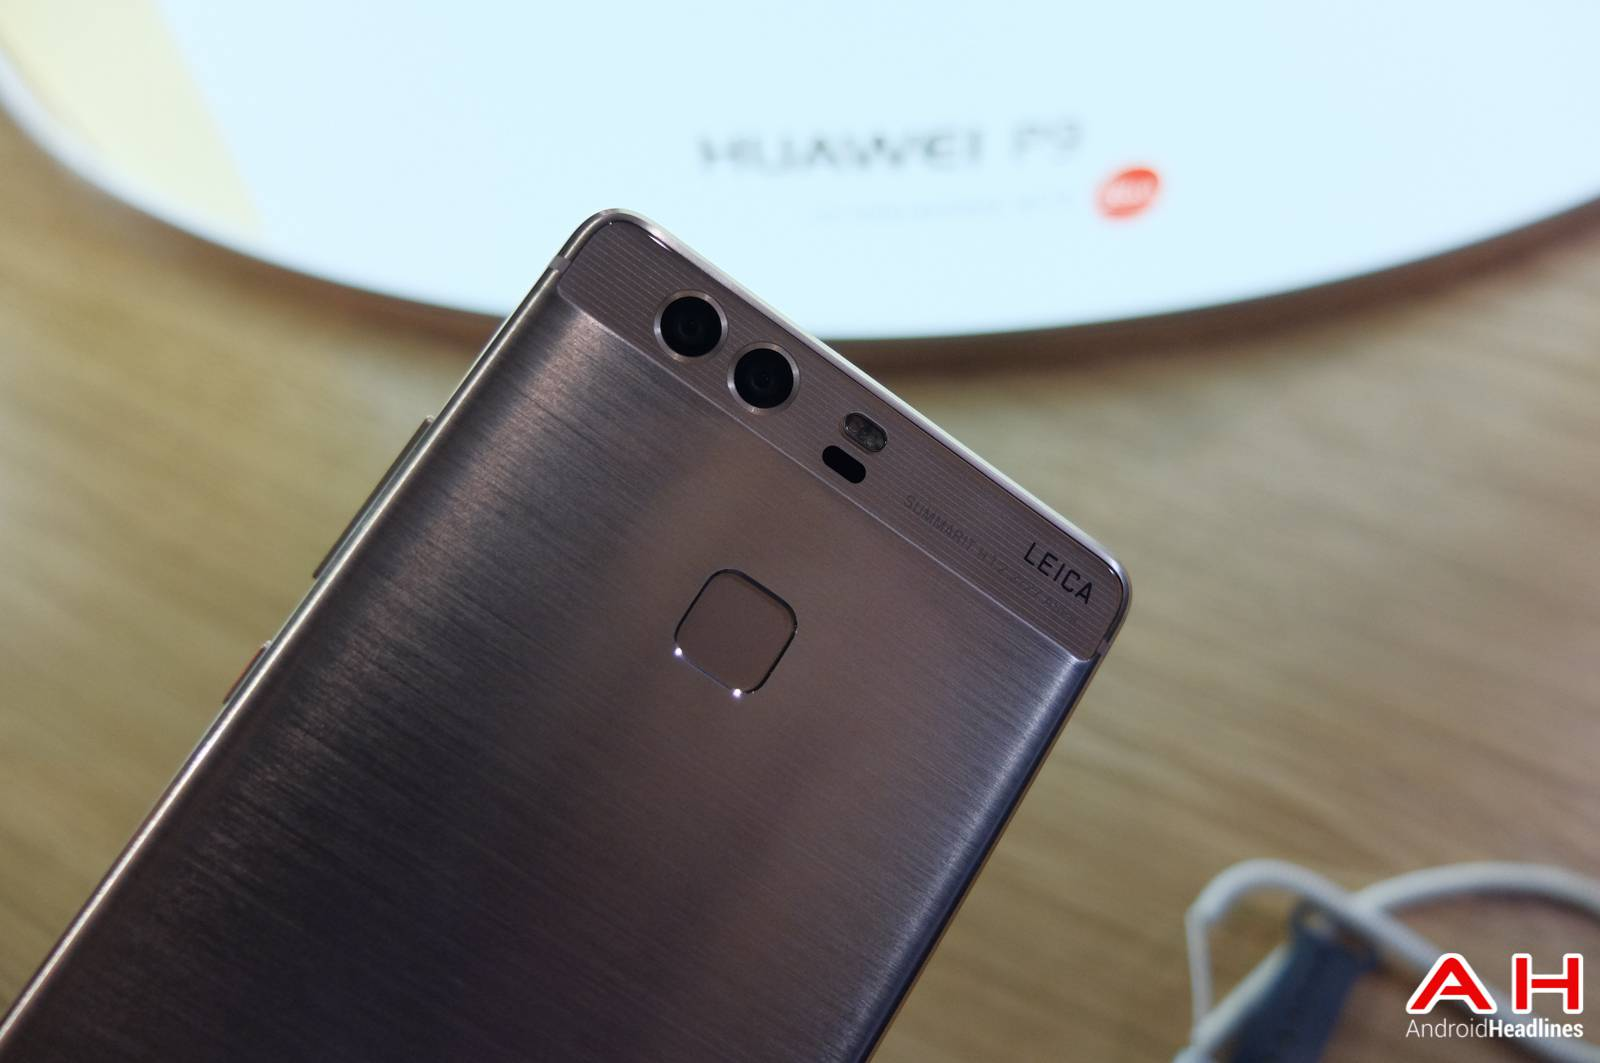 Huawei P9 Plus AH 0546